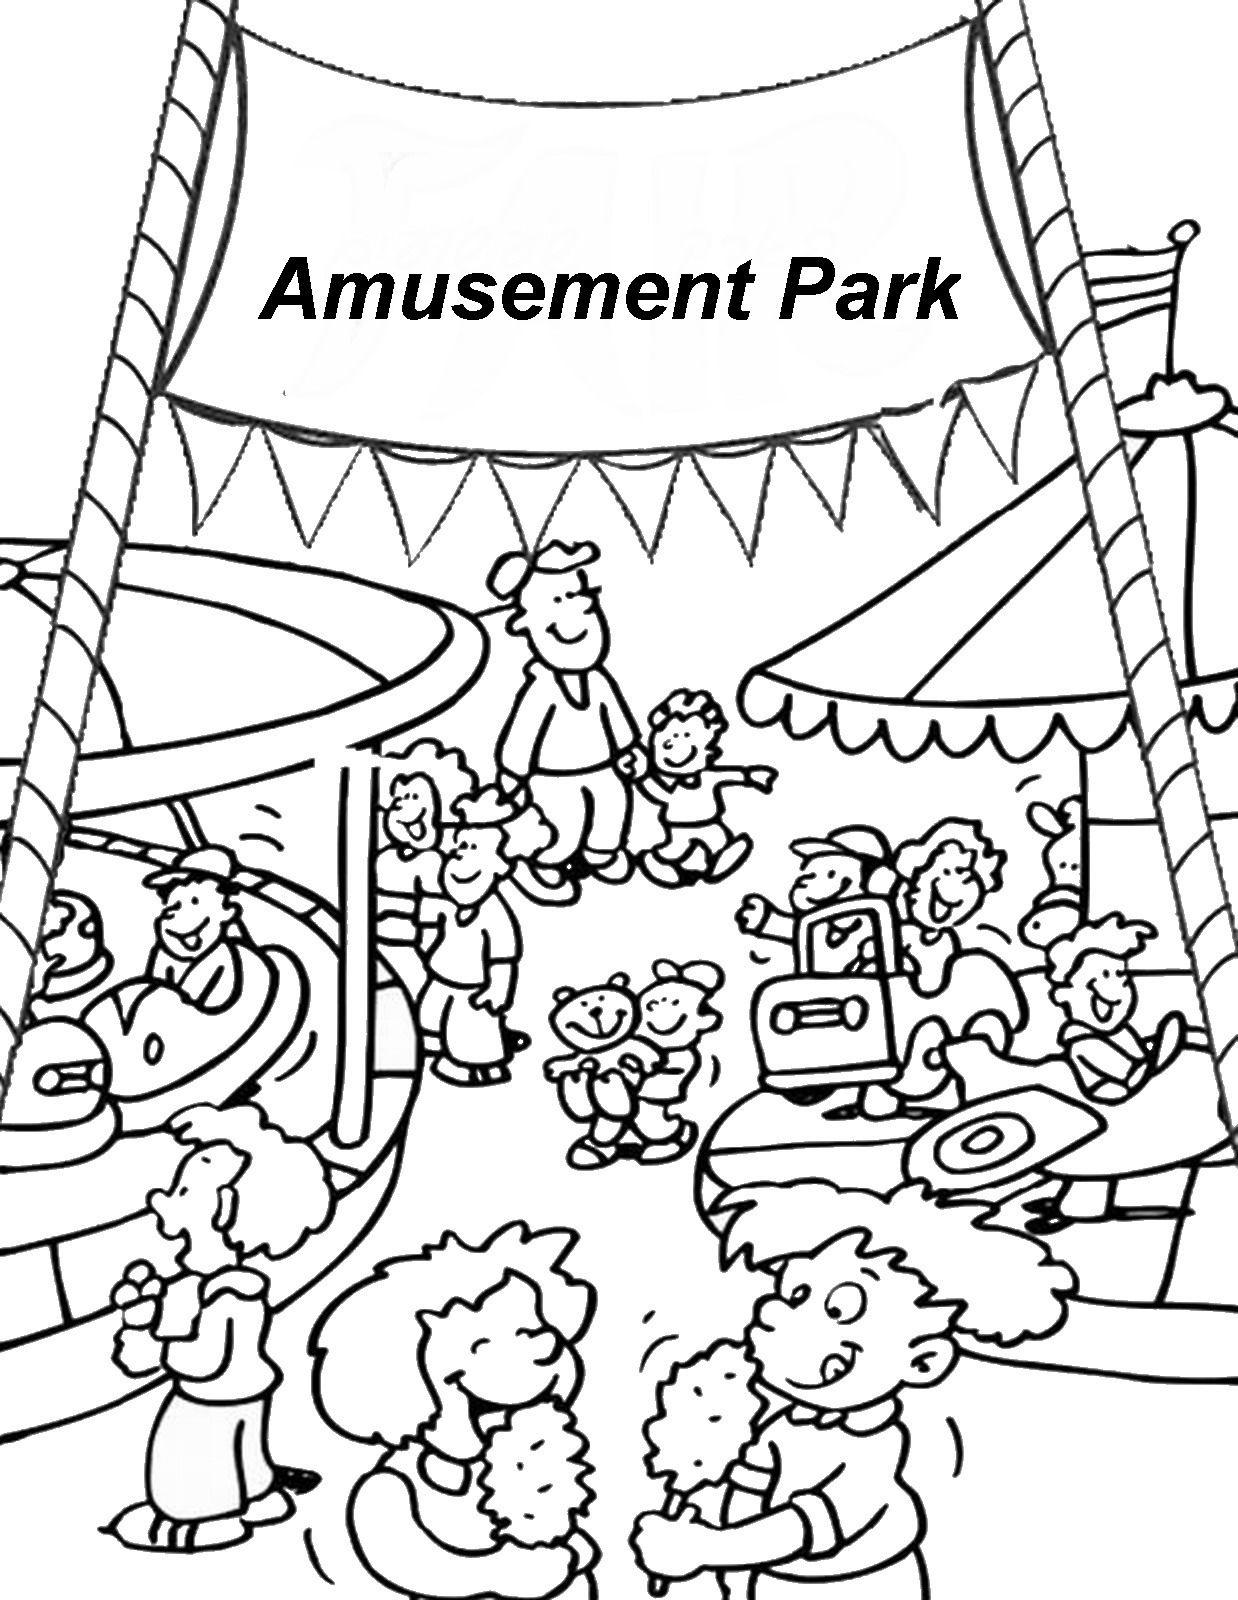 Amusement Park Coloring Pages Toddler Coloring Book Coloring Pages Cool Coloring Pages